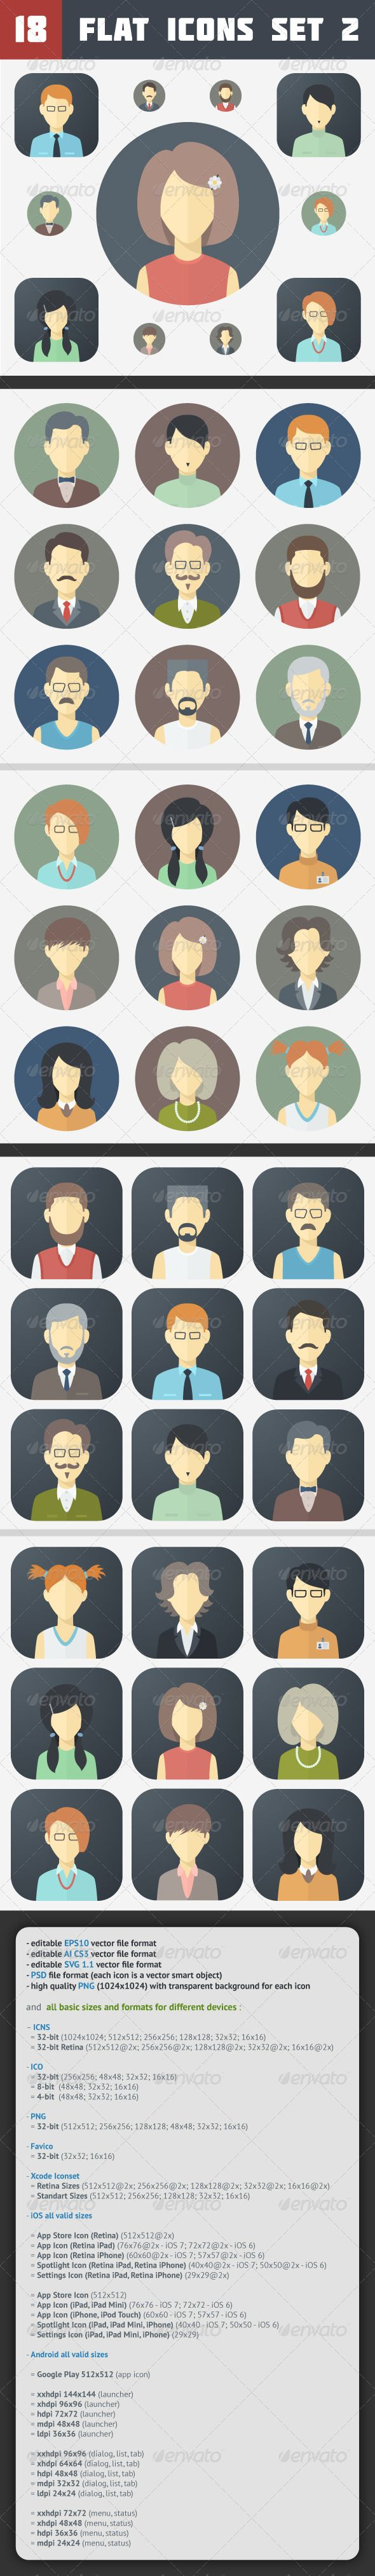 Minimalistic Flat Faces Icons   Buy and Download: http://graphicriver.net/item/minimalistic-flat-faces-icons-set-2/7093110?WT.ac=category_thumb&WT.z_author=MastakA&ref=ksioks